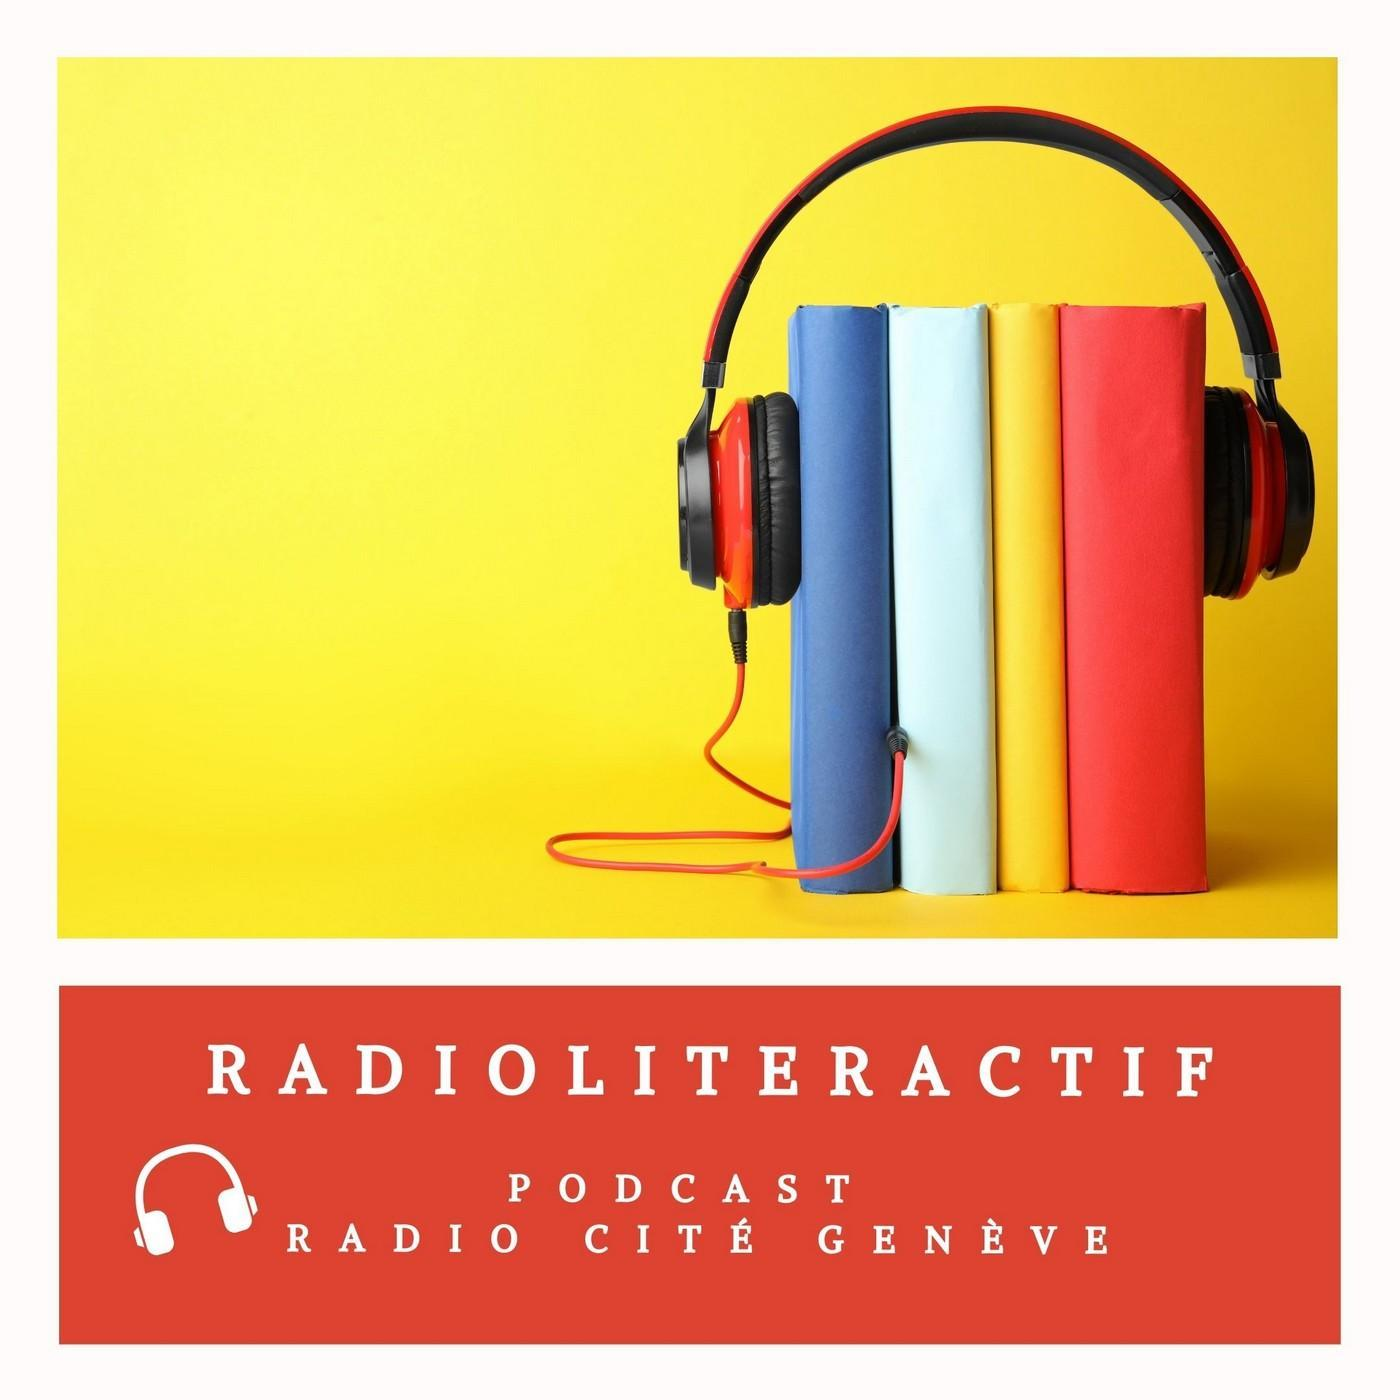 Radioliteractif du 05/07/2021 - Harry Koumrouyan